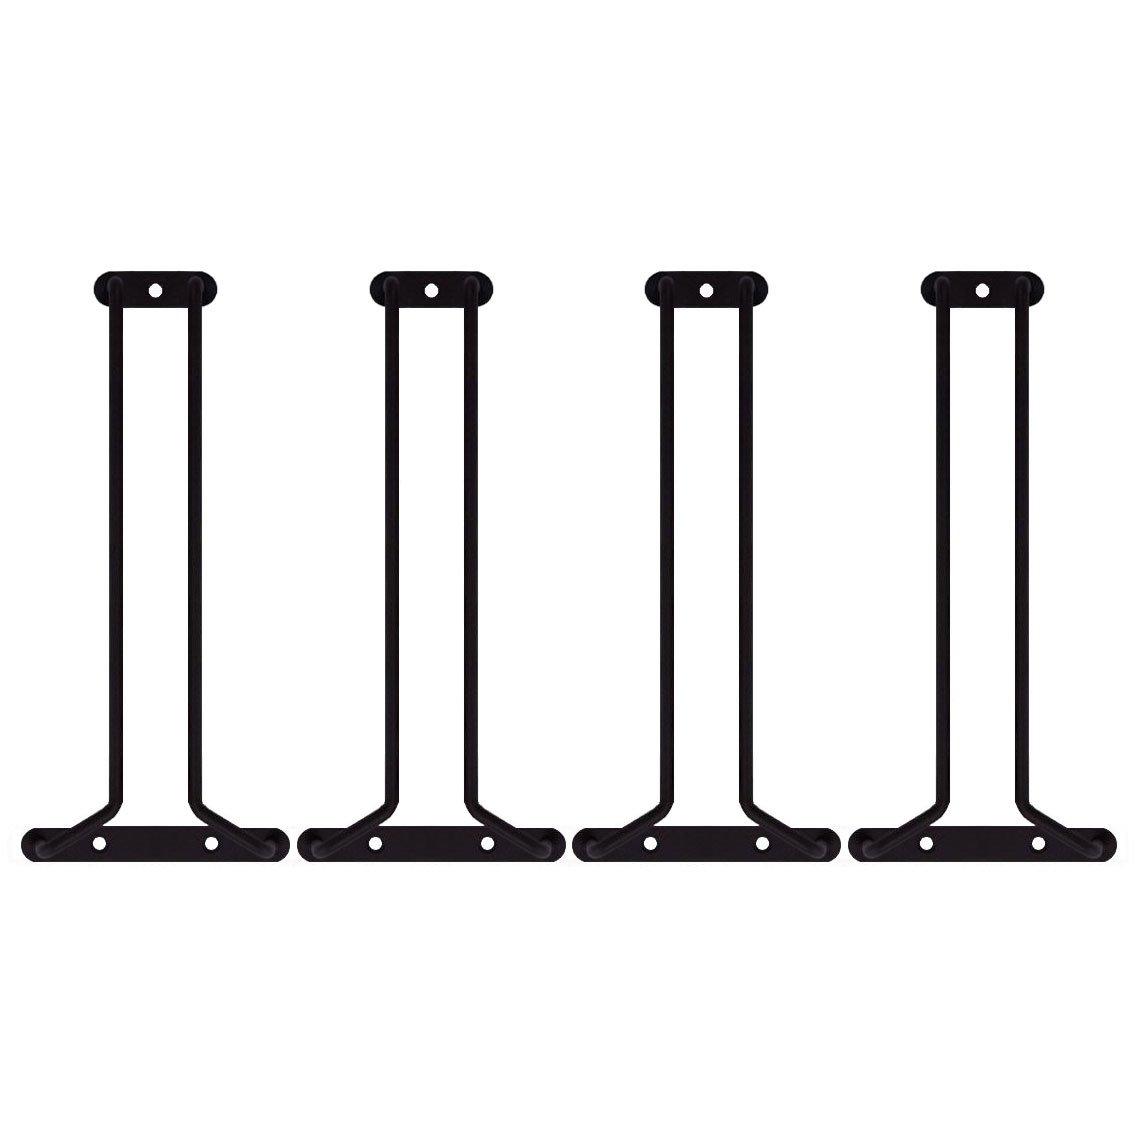 KegWorks Stemware Glass Hanger Racks - Oil Rubbed Bronze - 10'' L - Set of 4 by KegWorks